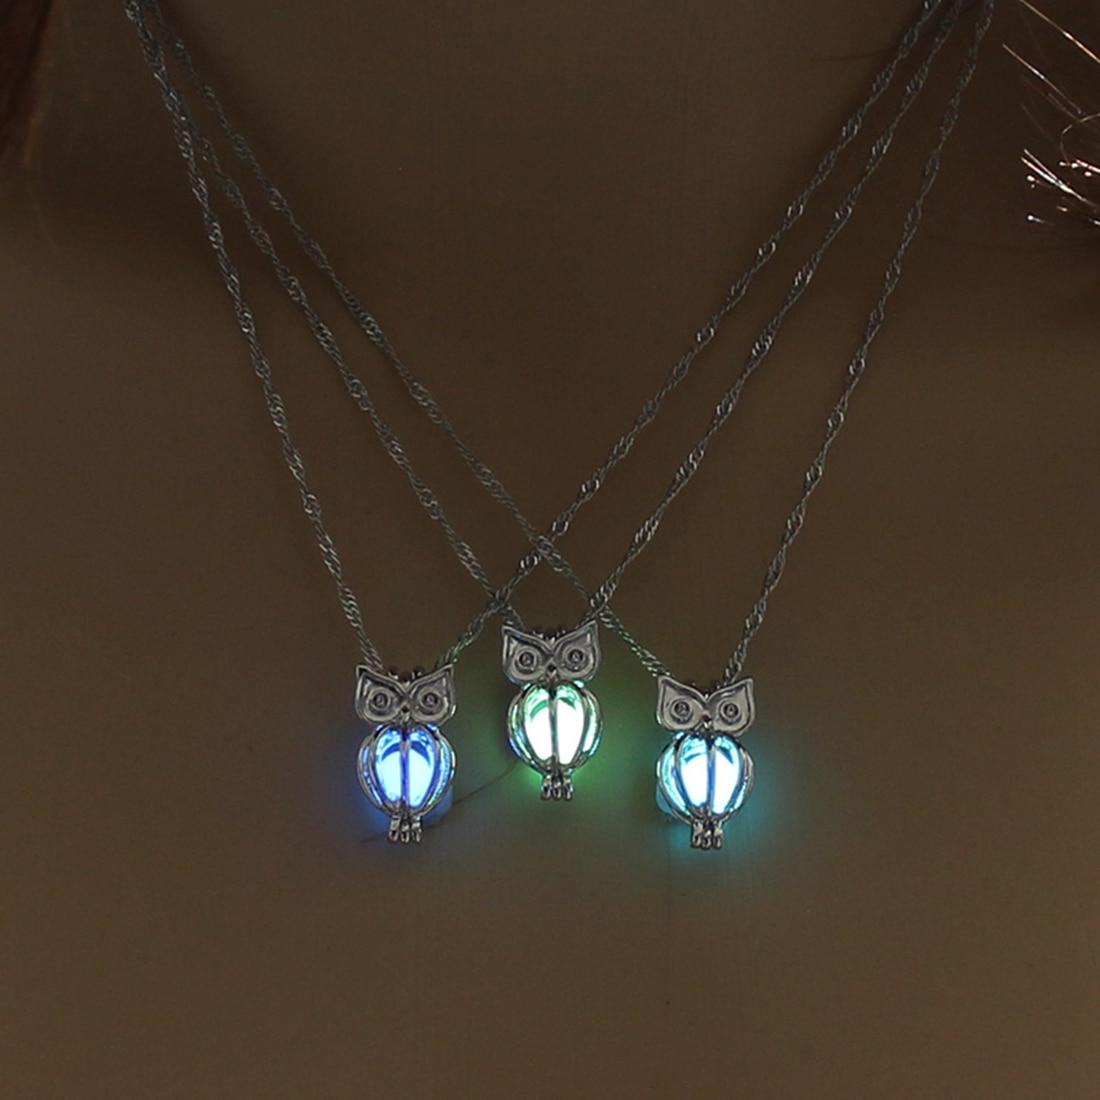 charm-glowing-owl-pendant-necklace-cute-luminous-fontbjewelry-b-font-choker-3-colors-christmas-gift-